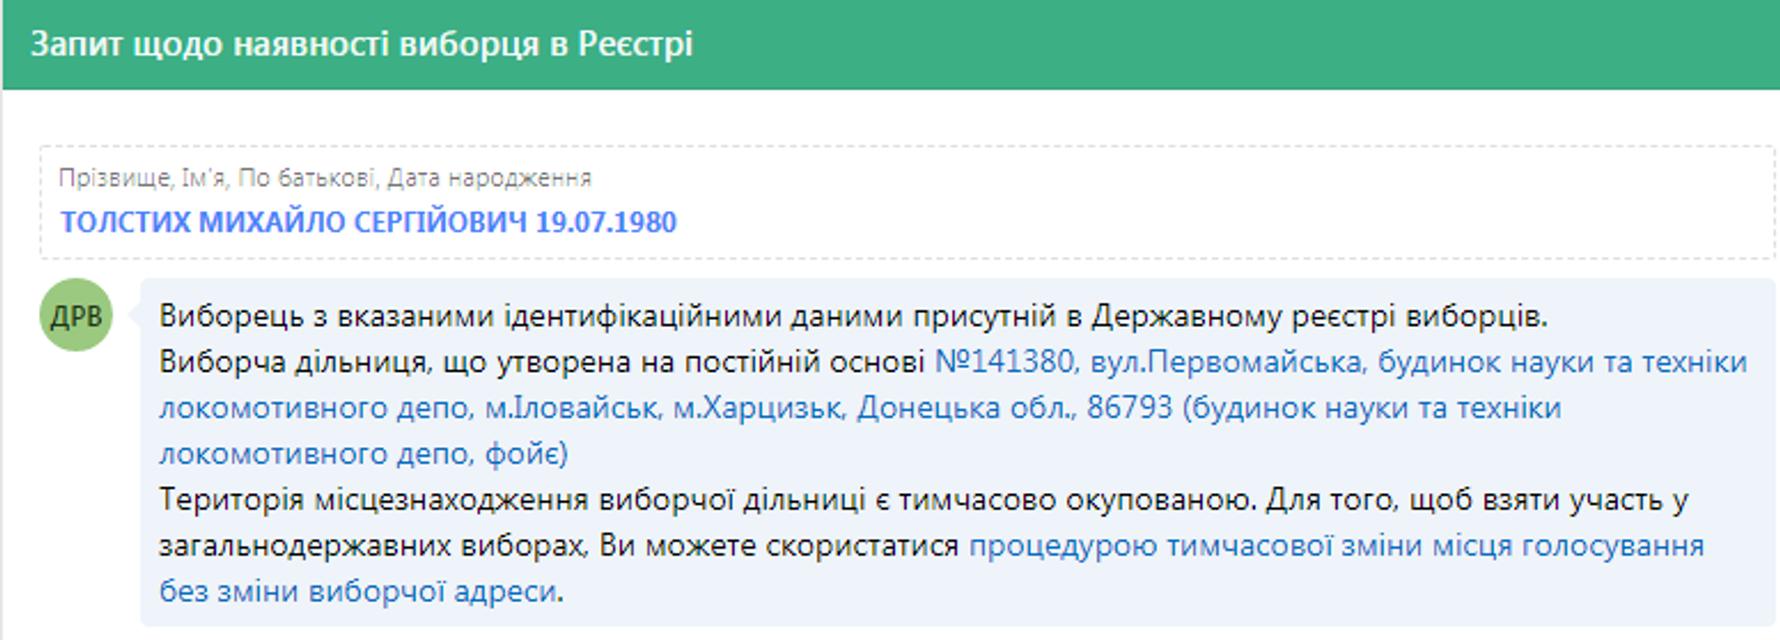 Гиви и Захарченко проголосуют на выборах: фотофакт - фото 177558